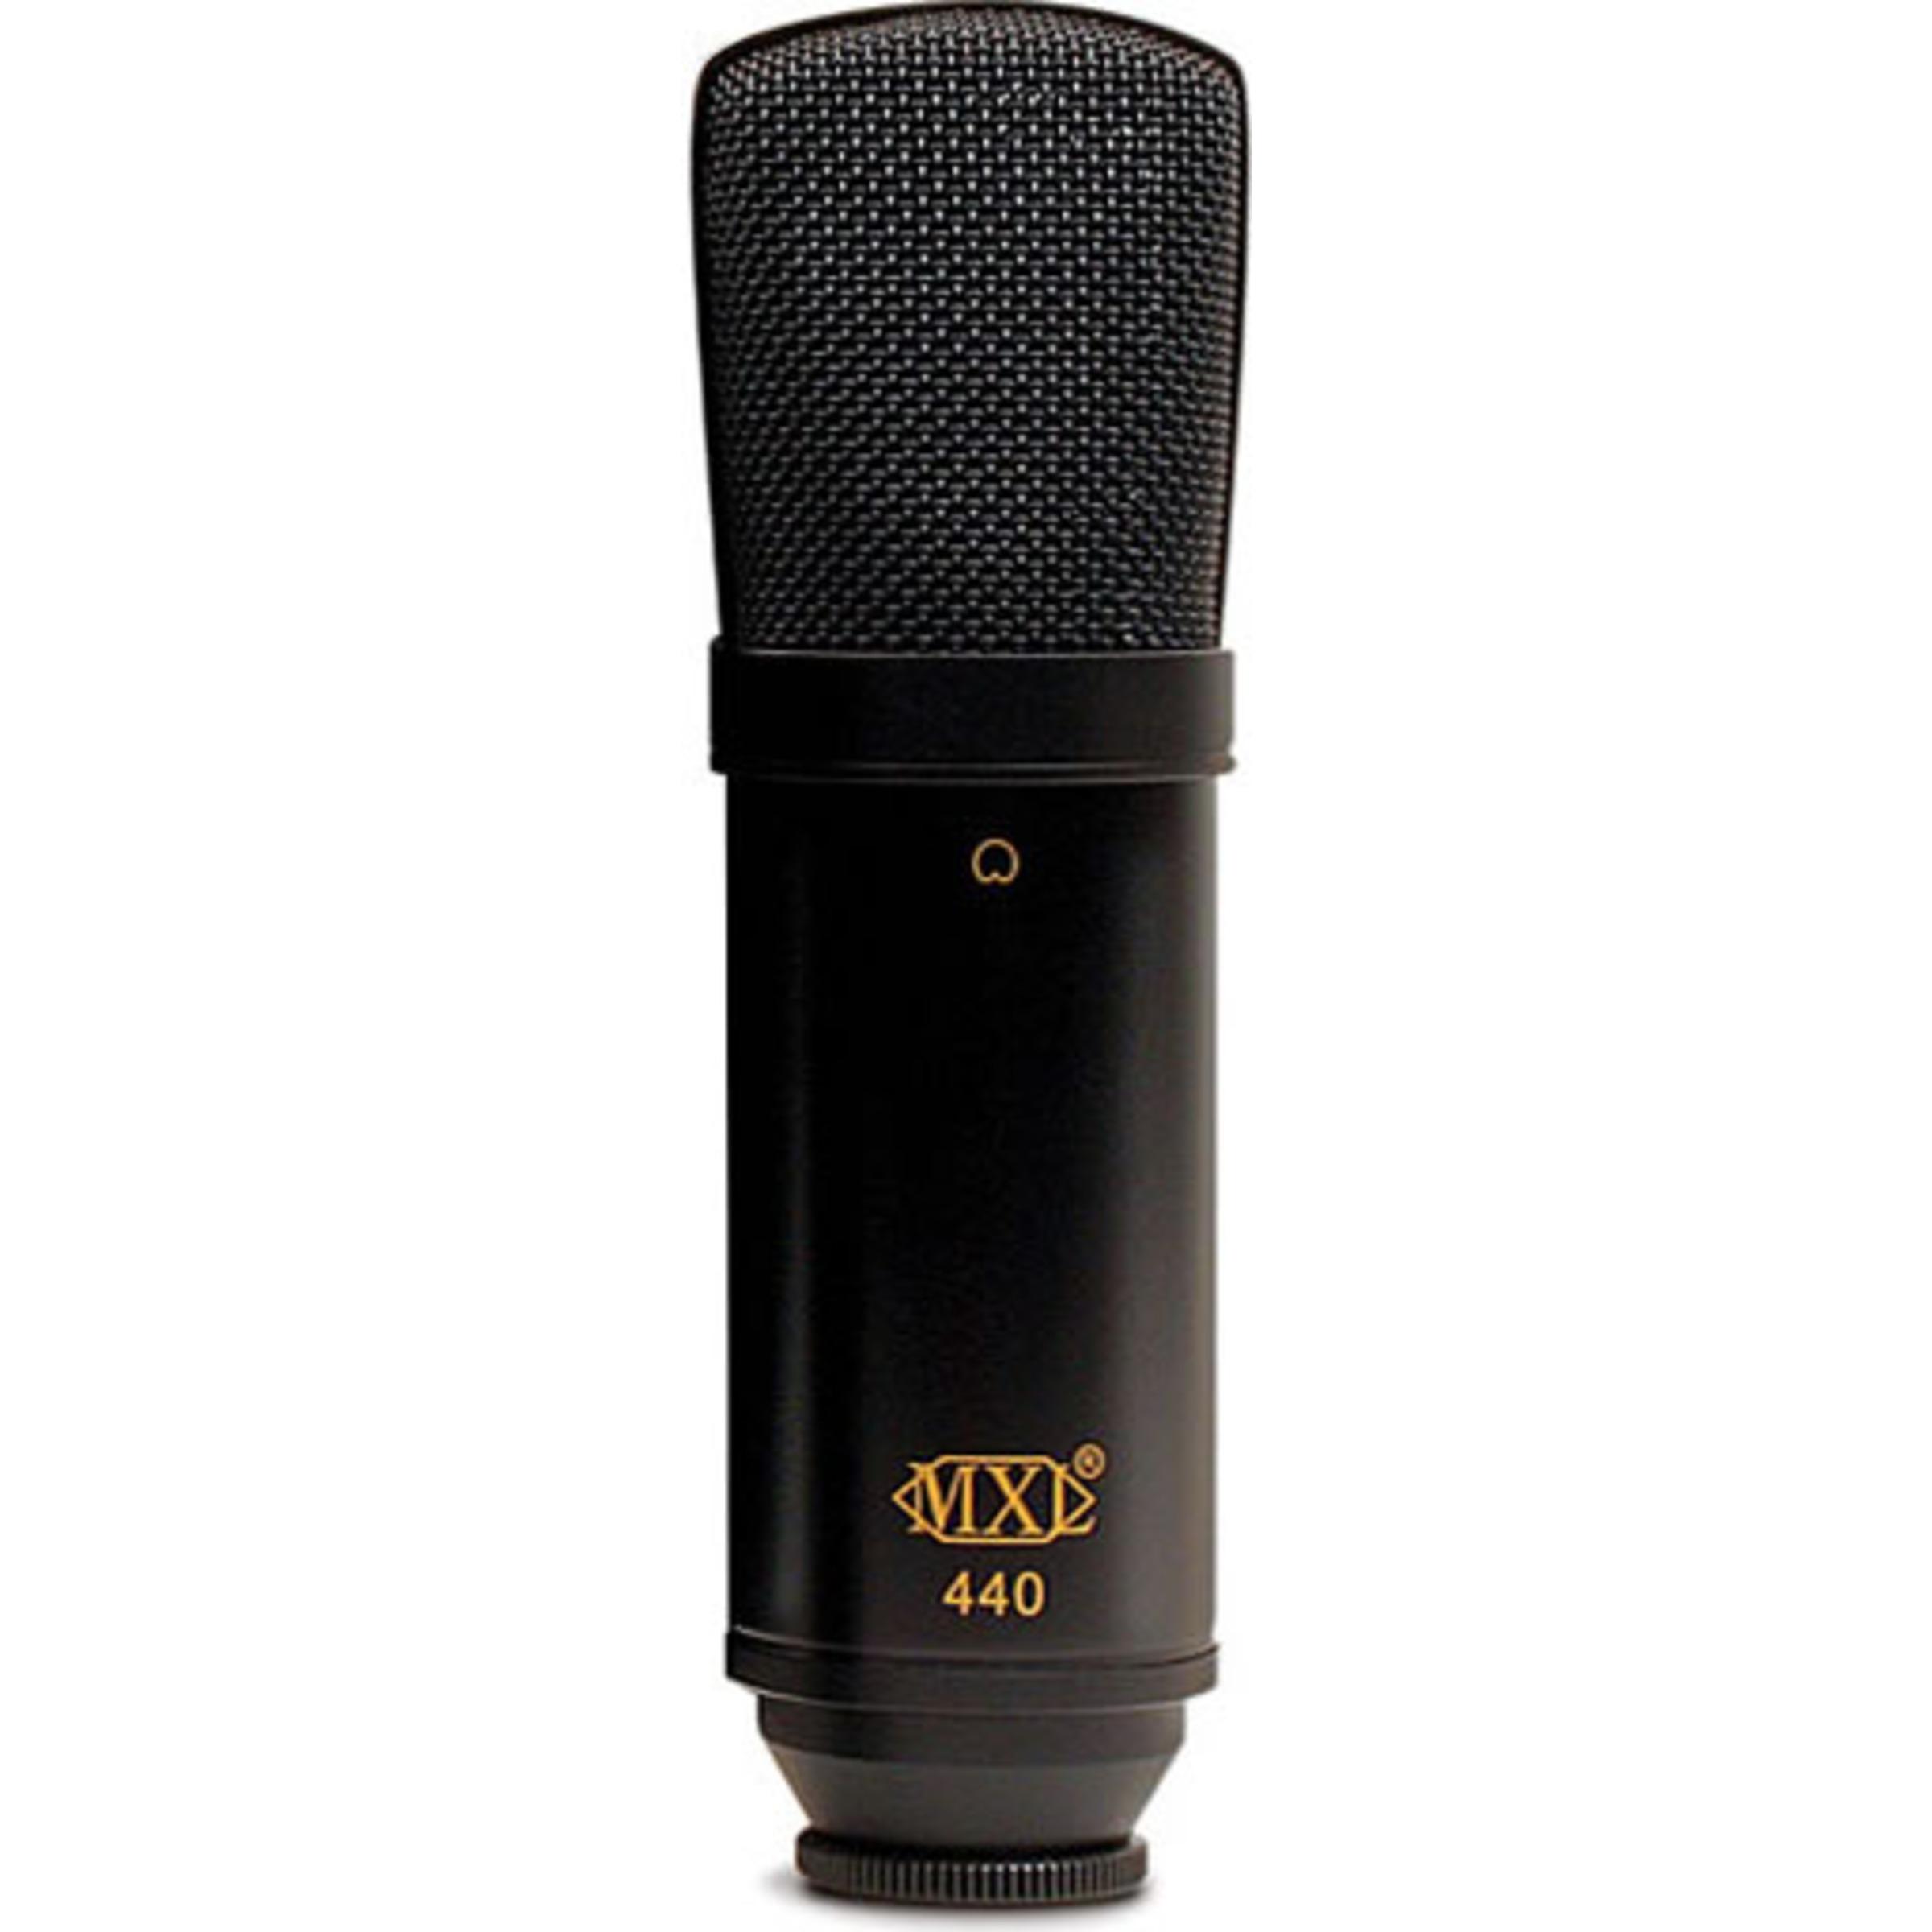 pa mics mxl 440 studio condenser mic giggear. Black Bedroom Furniture Sets. Home Design Ideas